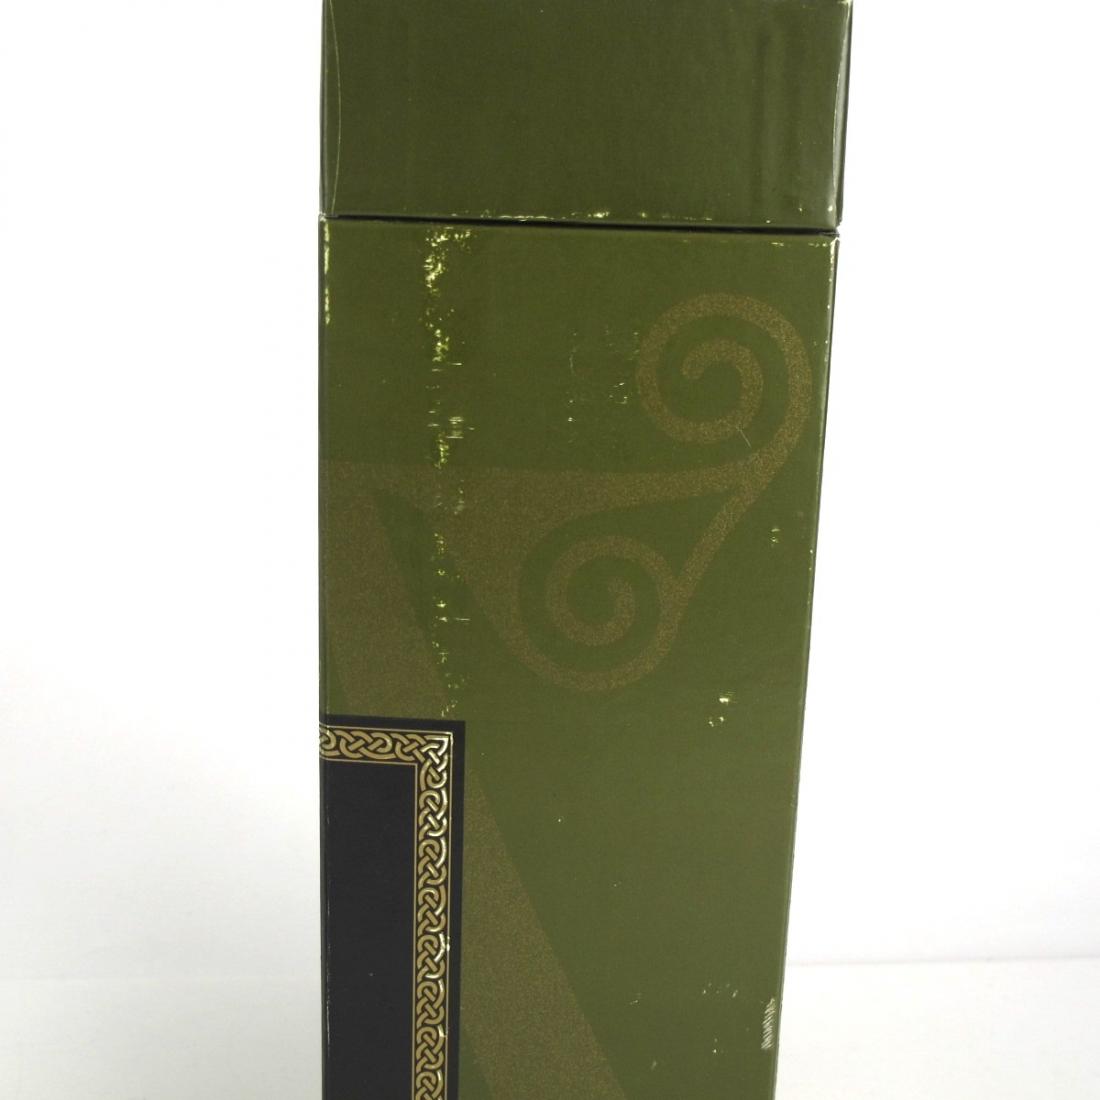 Ardbeg Uigeadail 2004 Release